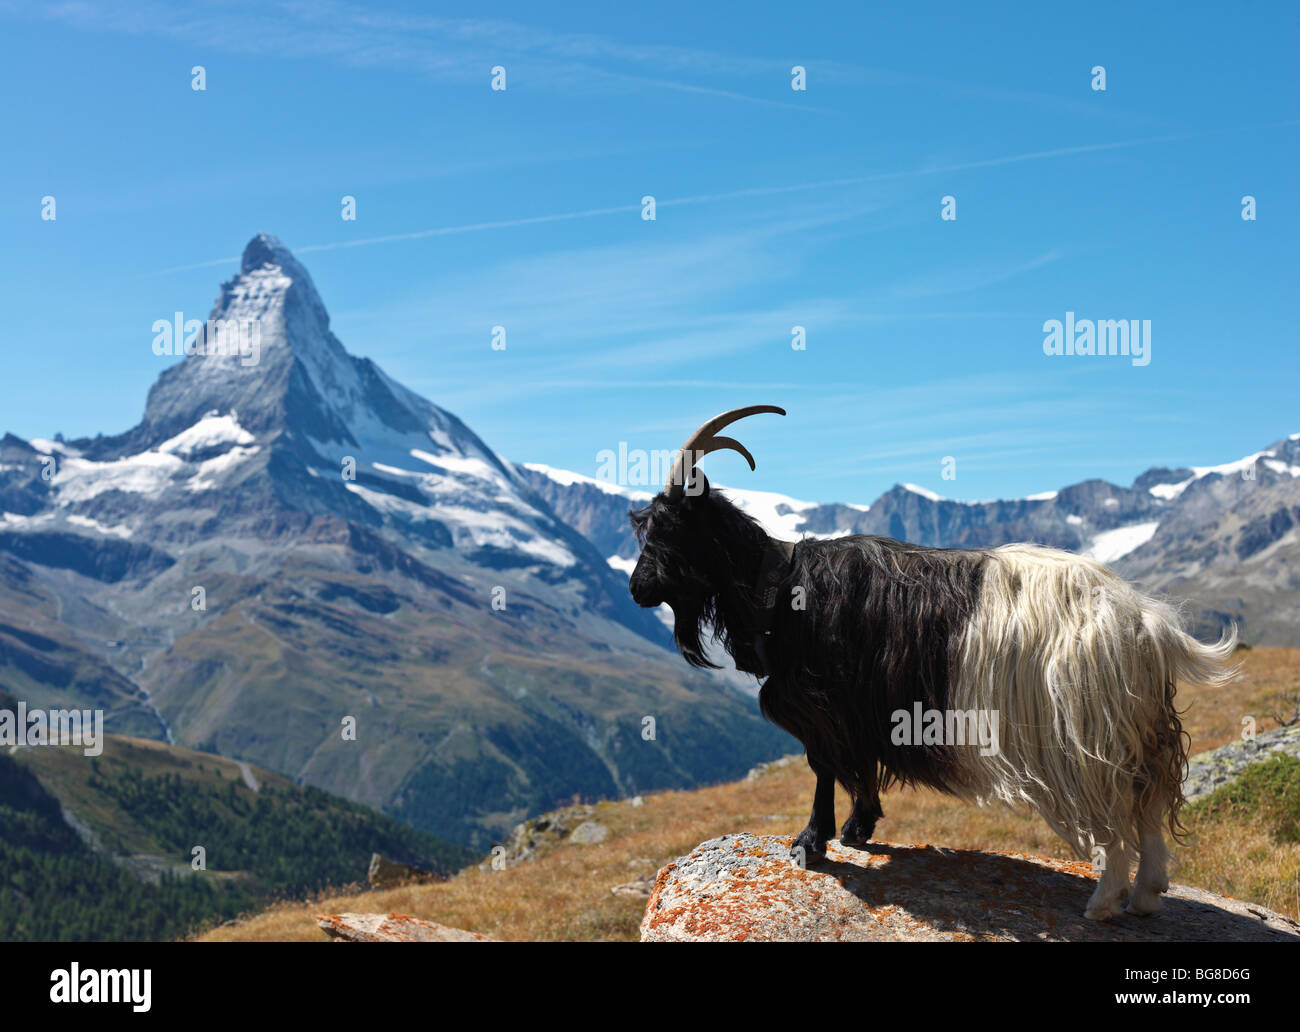 Switzerland, Valais, Zermatt,mountain goat with the Matterhorn in background - Stock Image